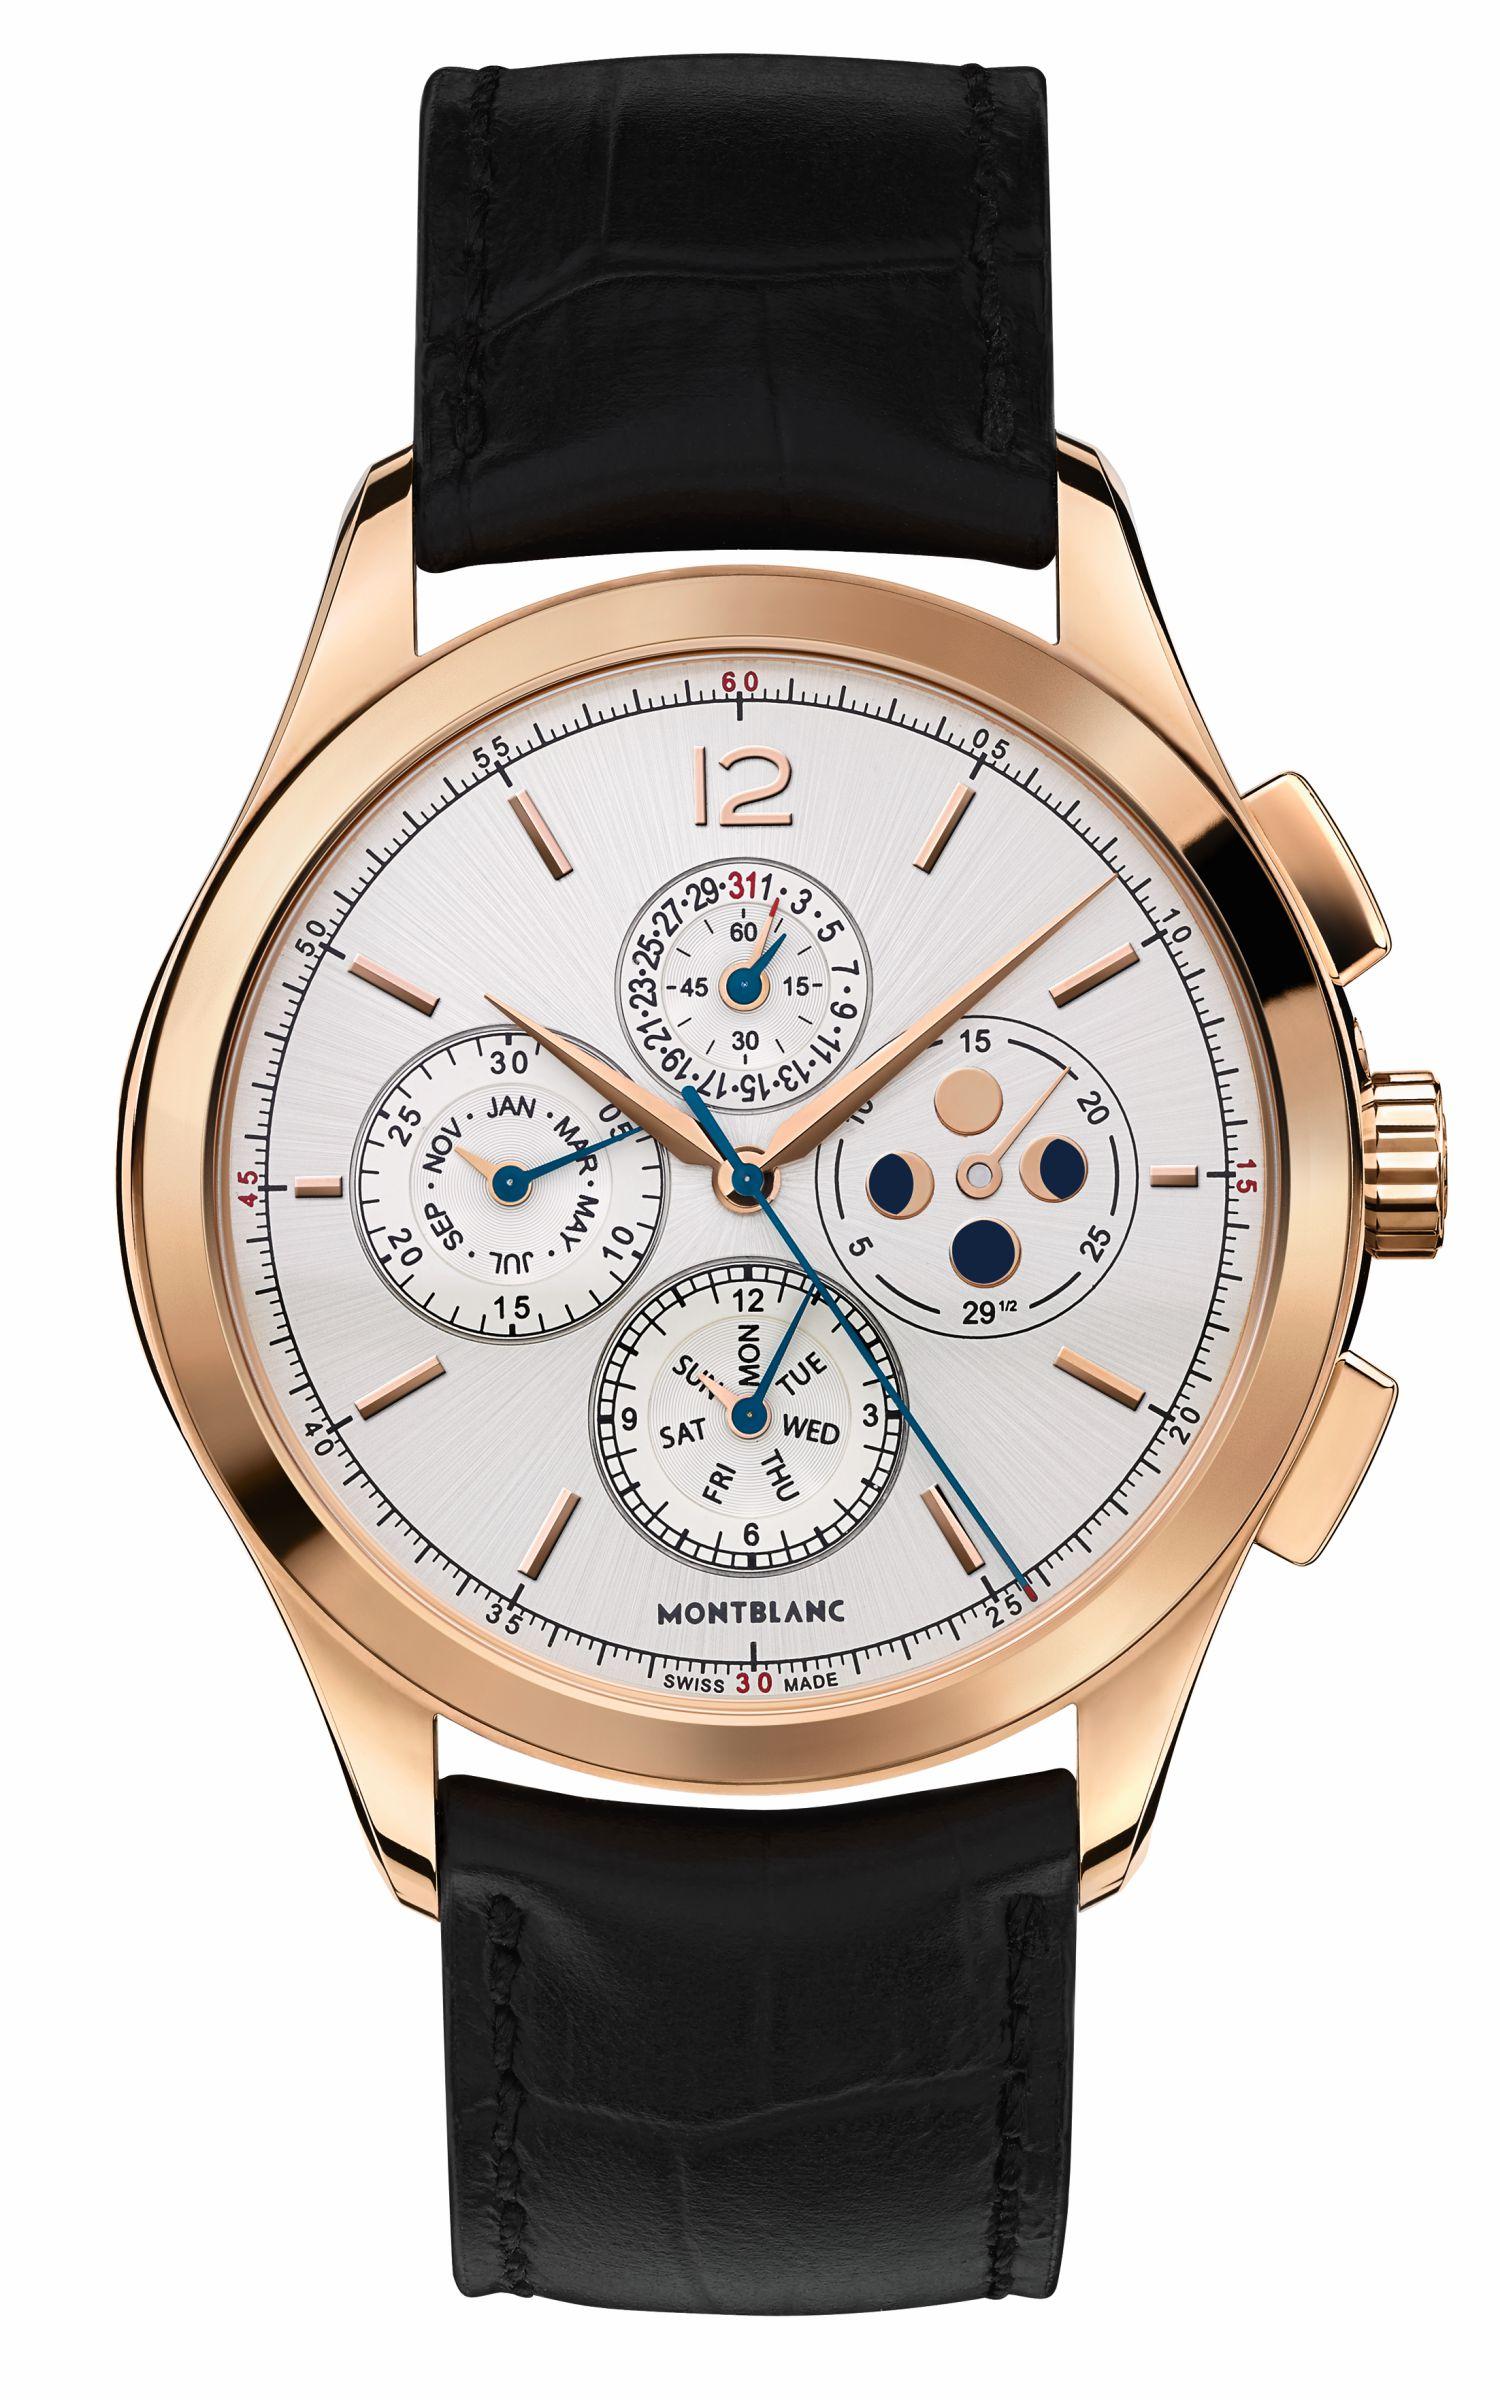 Montblanc-Heritage-Chronometrie-Chronograph-Quantiame-Annuel-1.jpg